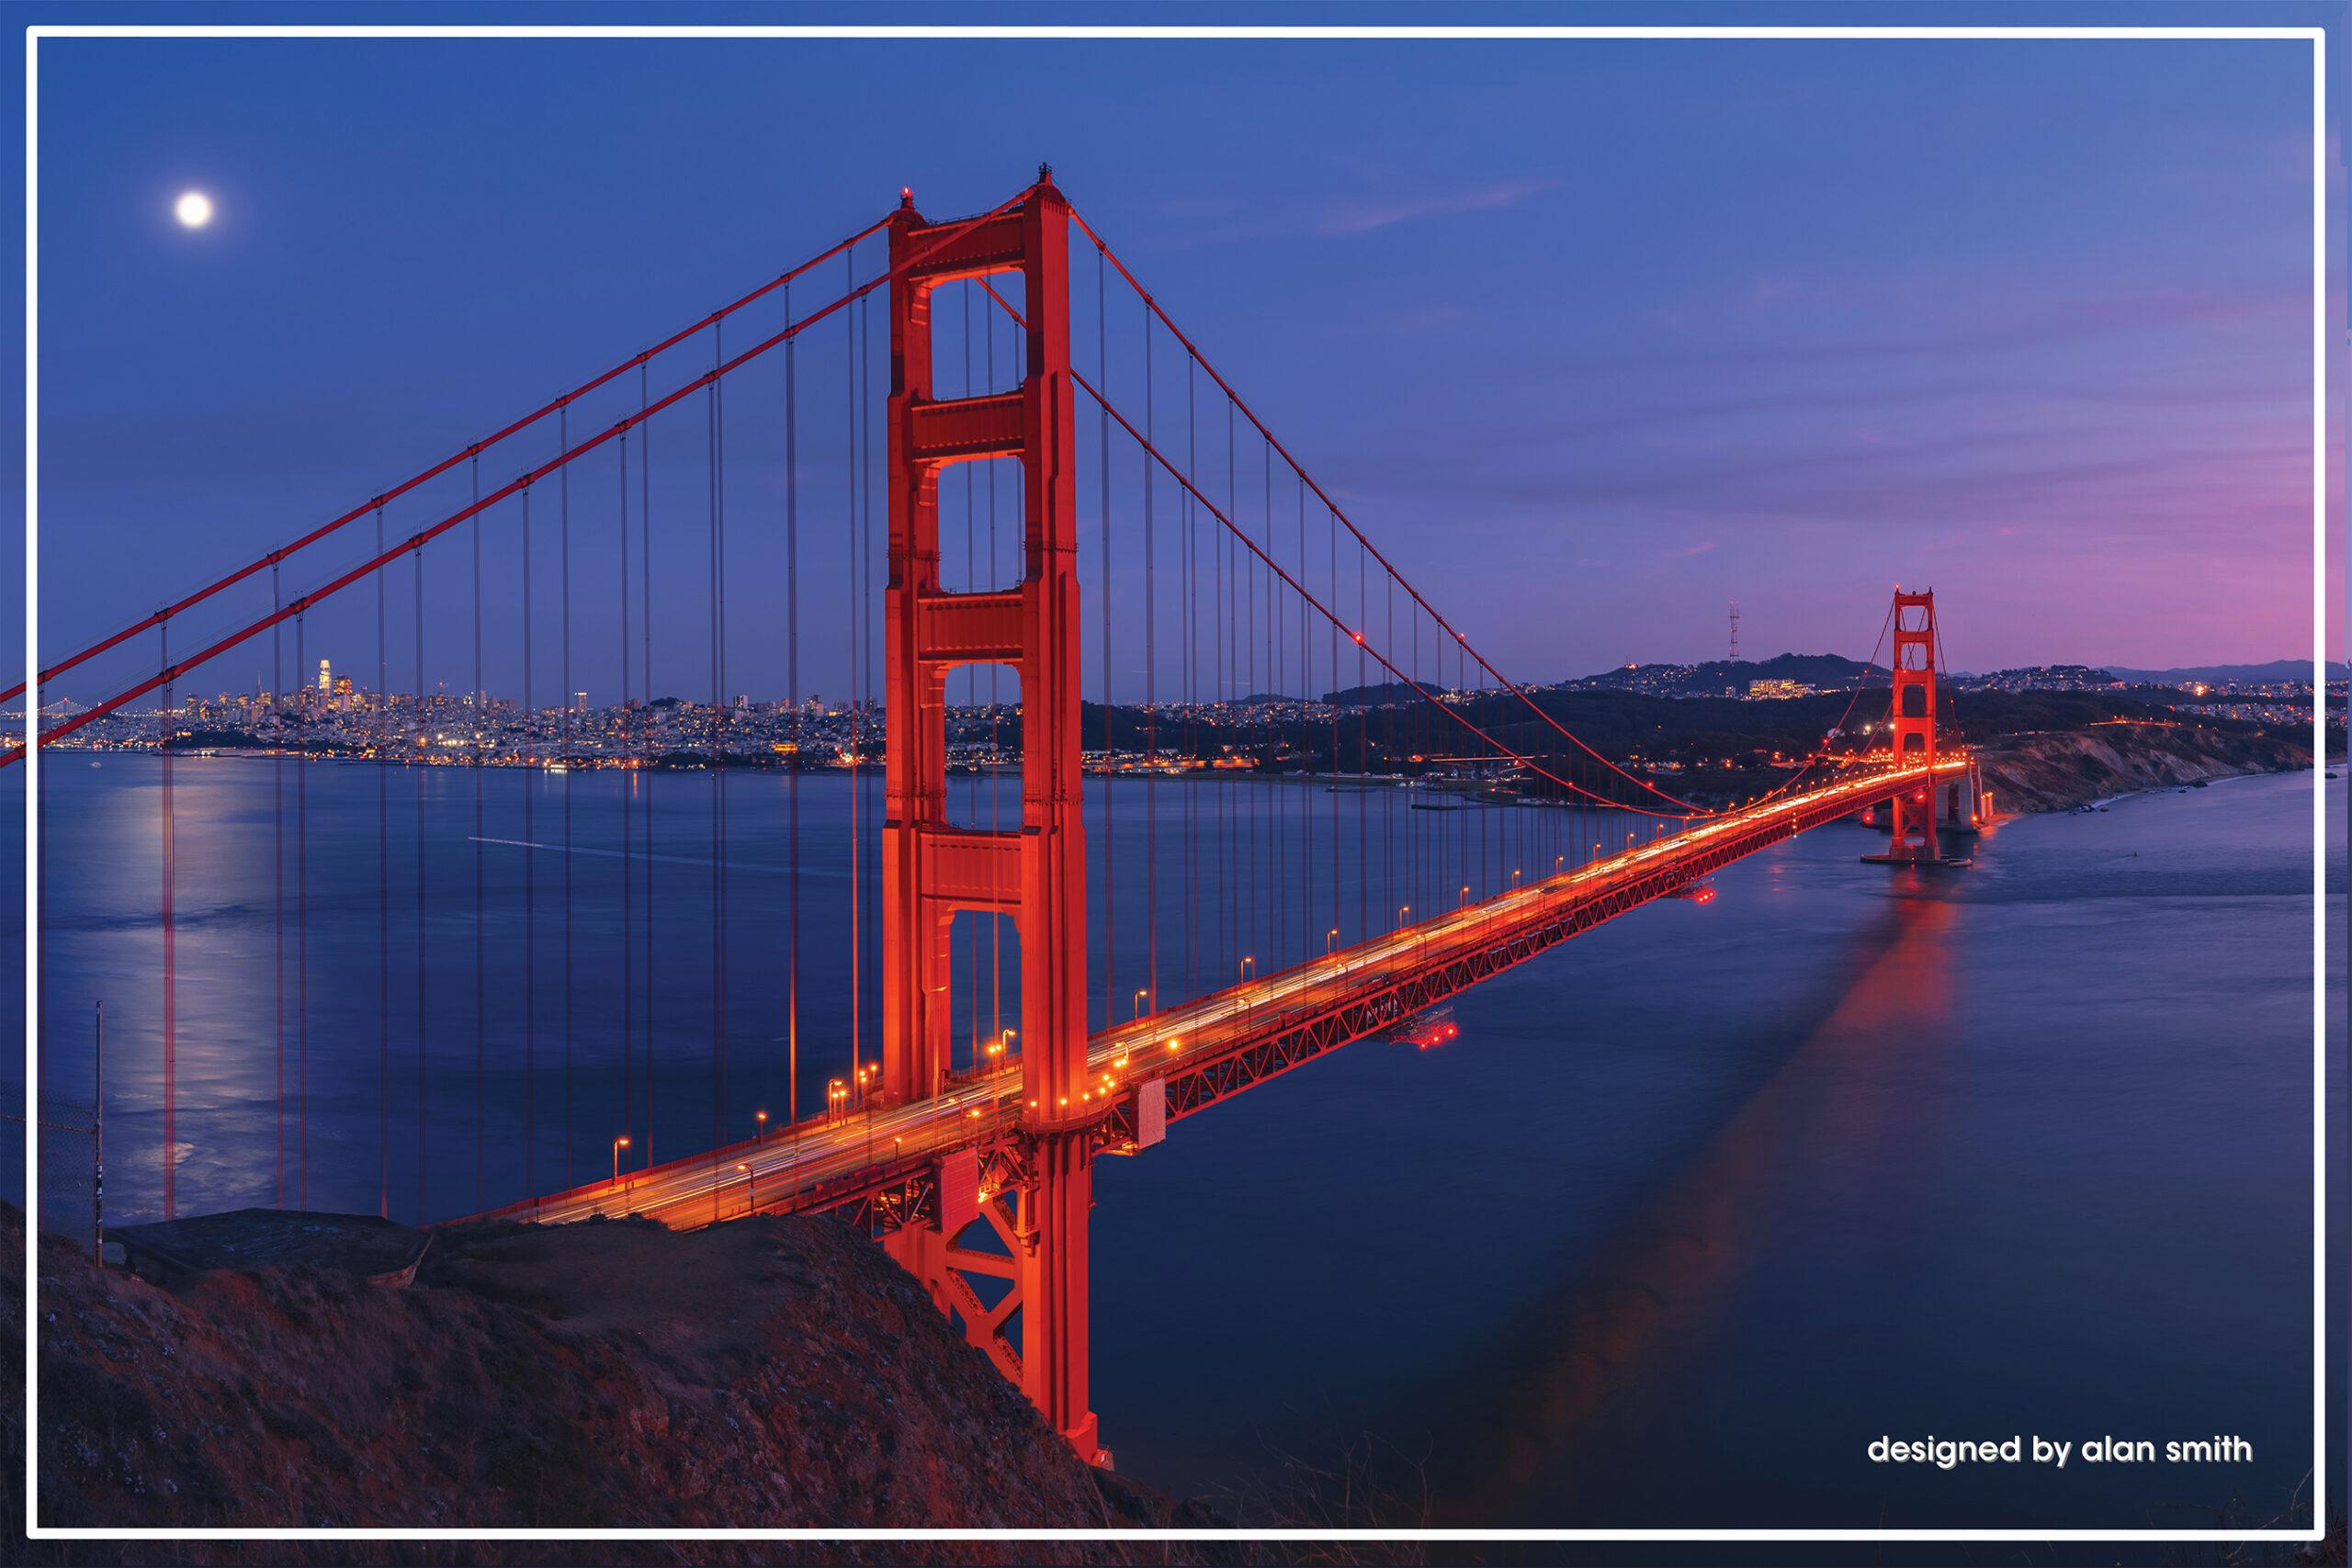 California Blue designed by Alan Smith